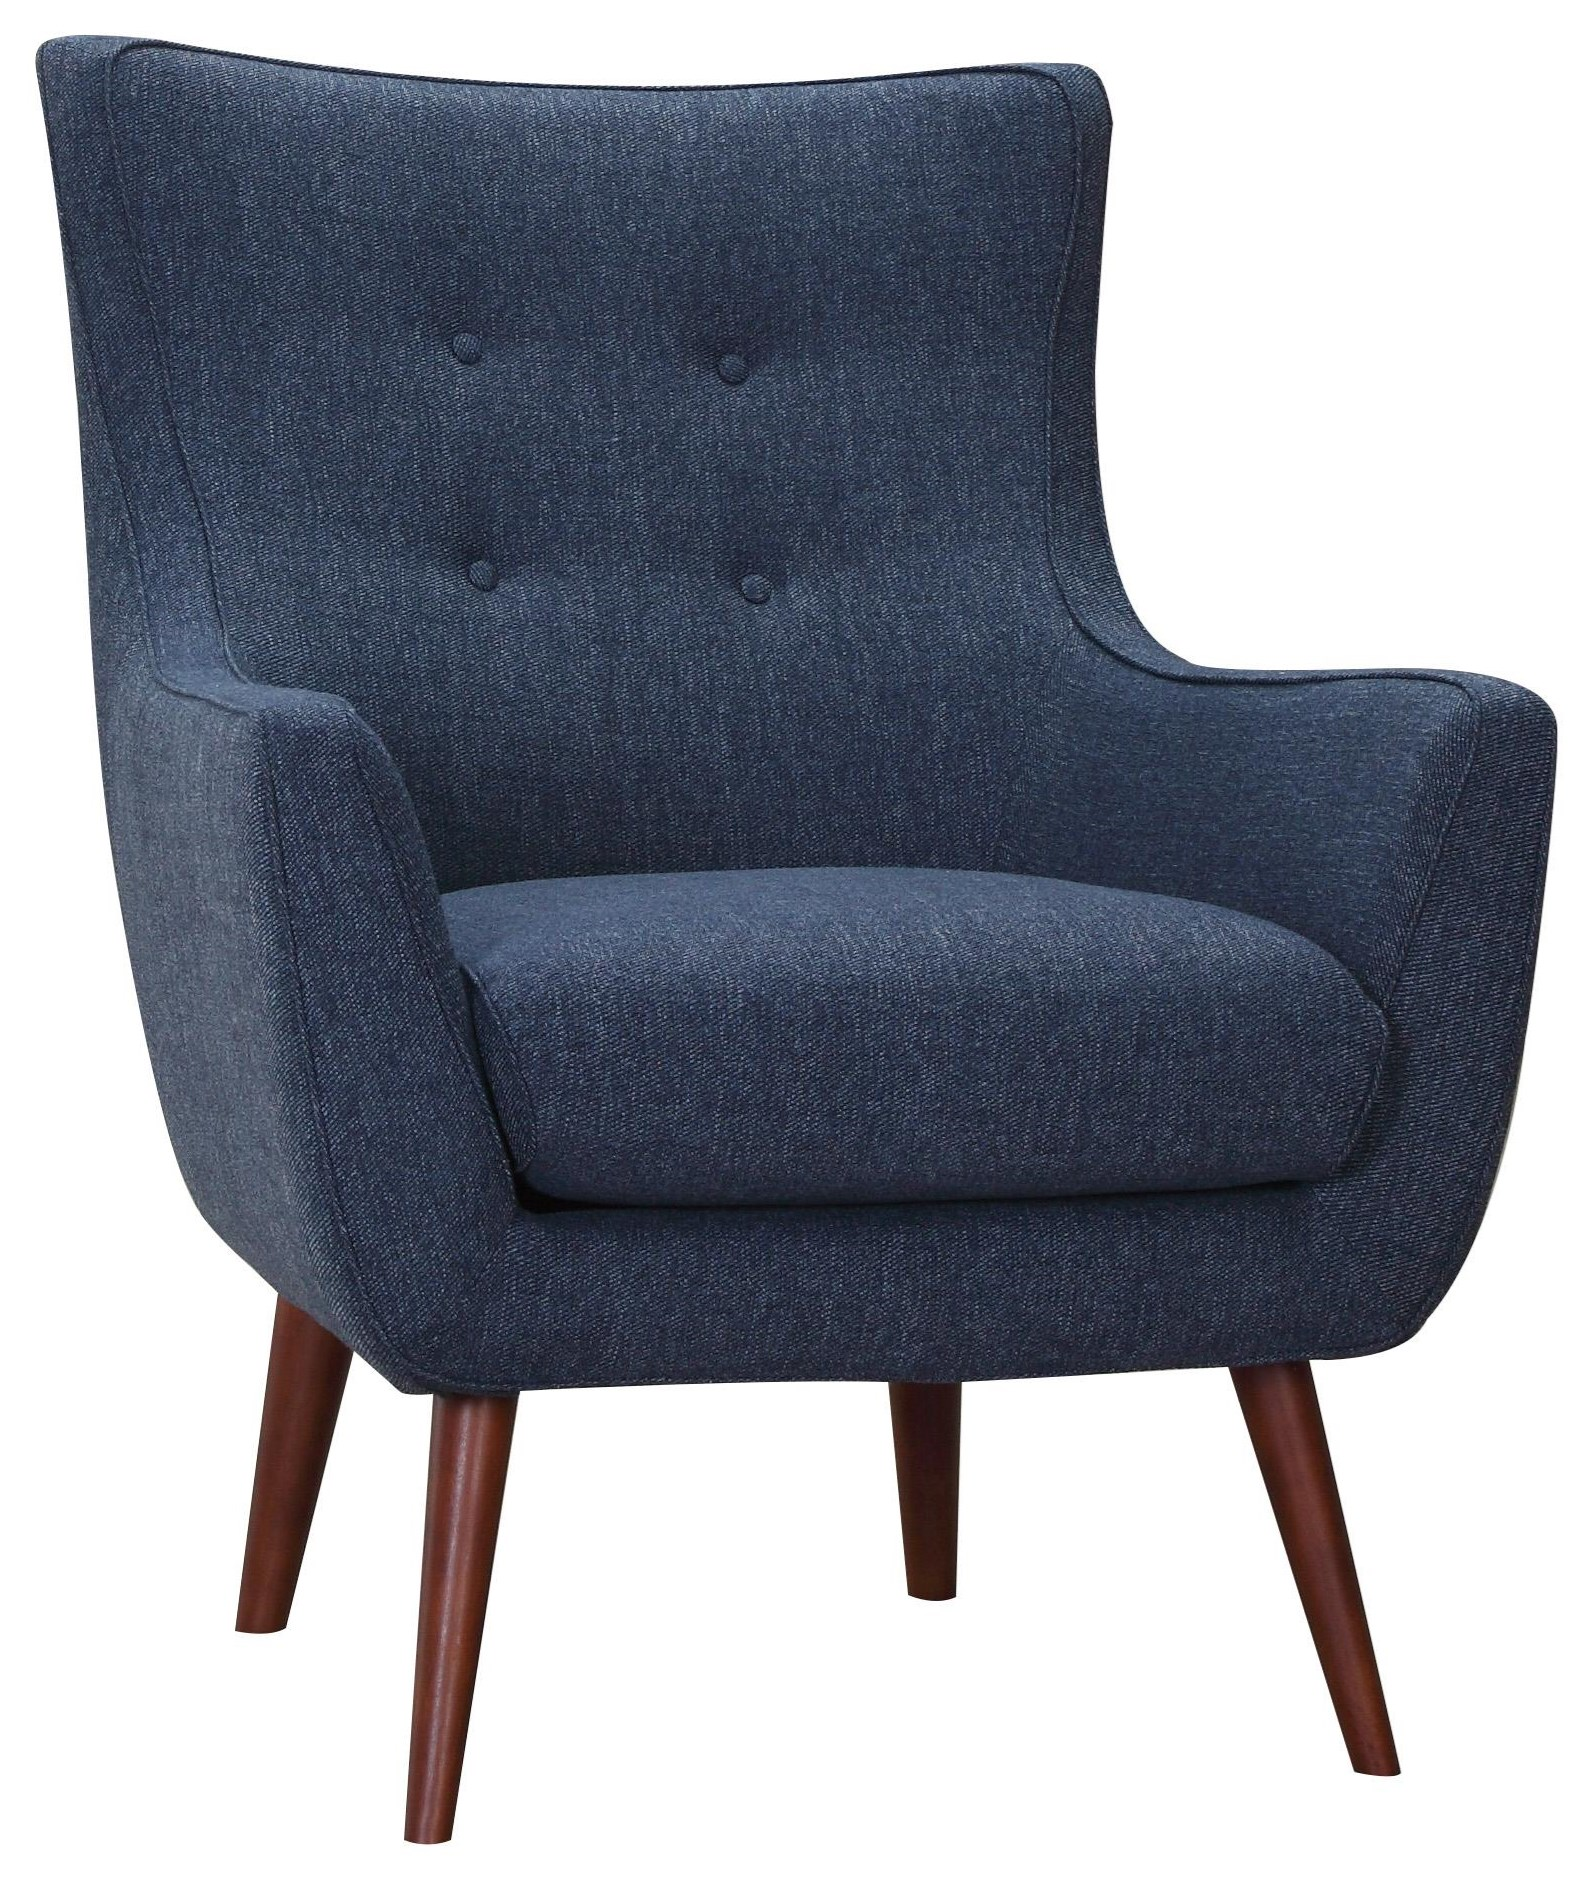 Kato Kato Chair by Urban Chic at Stoney Creek Furniture